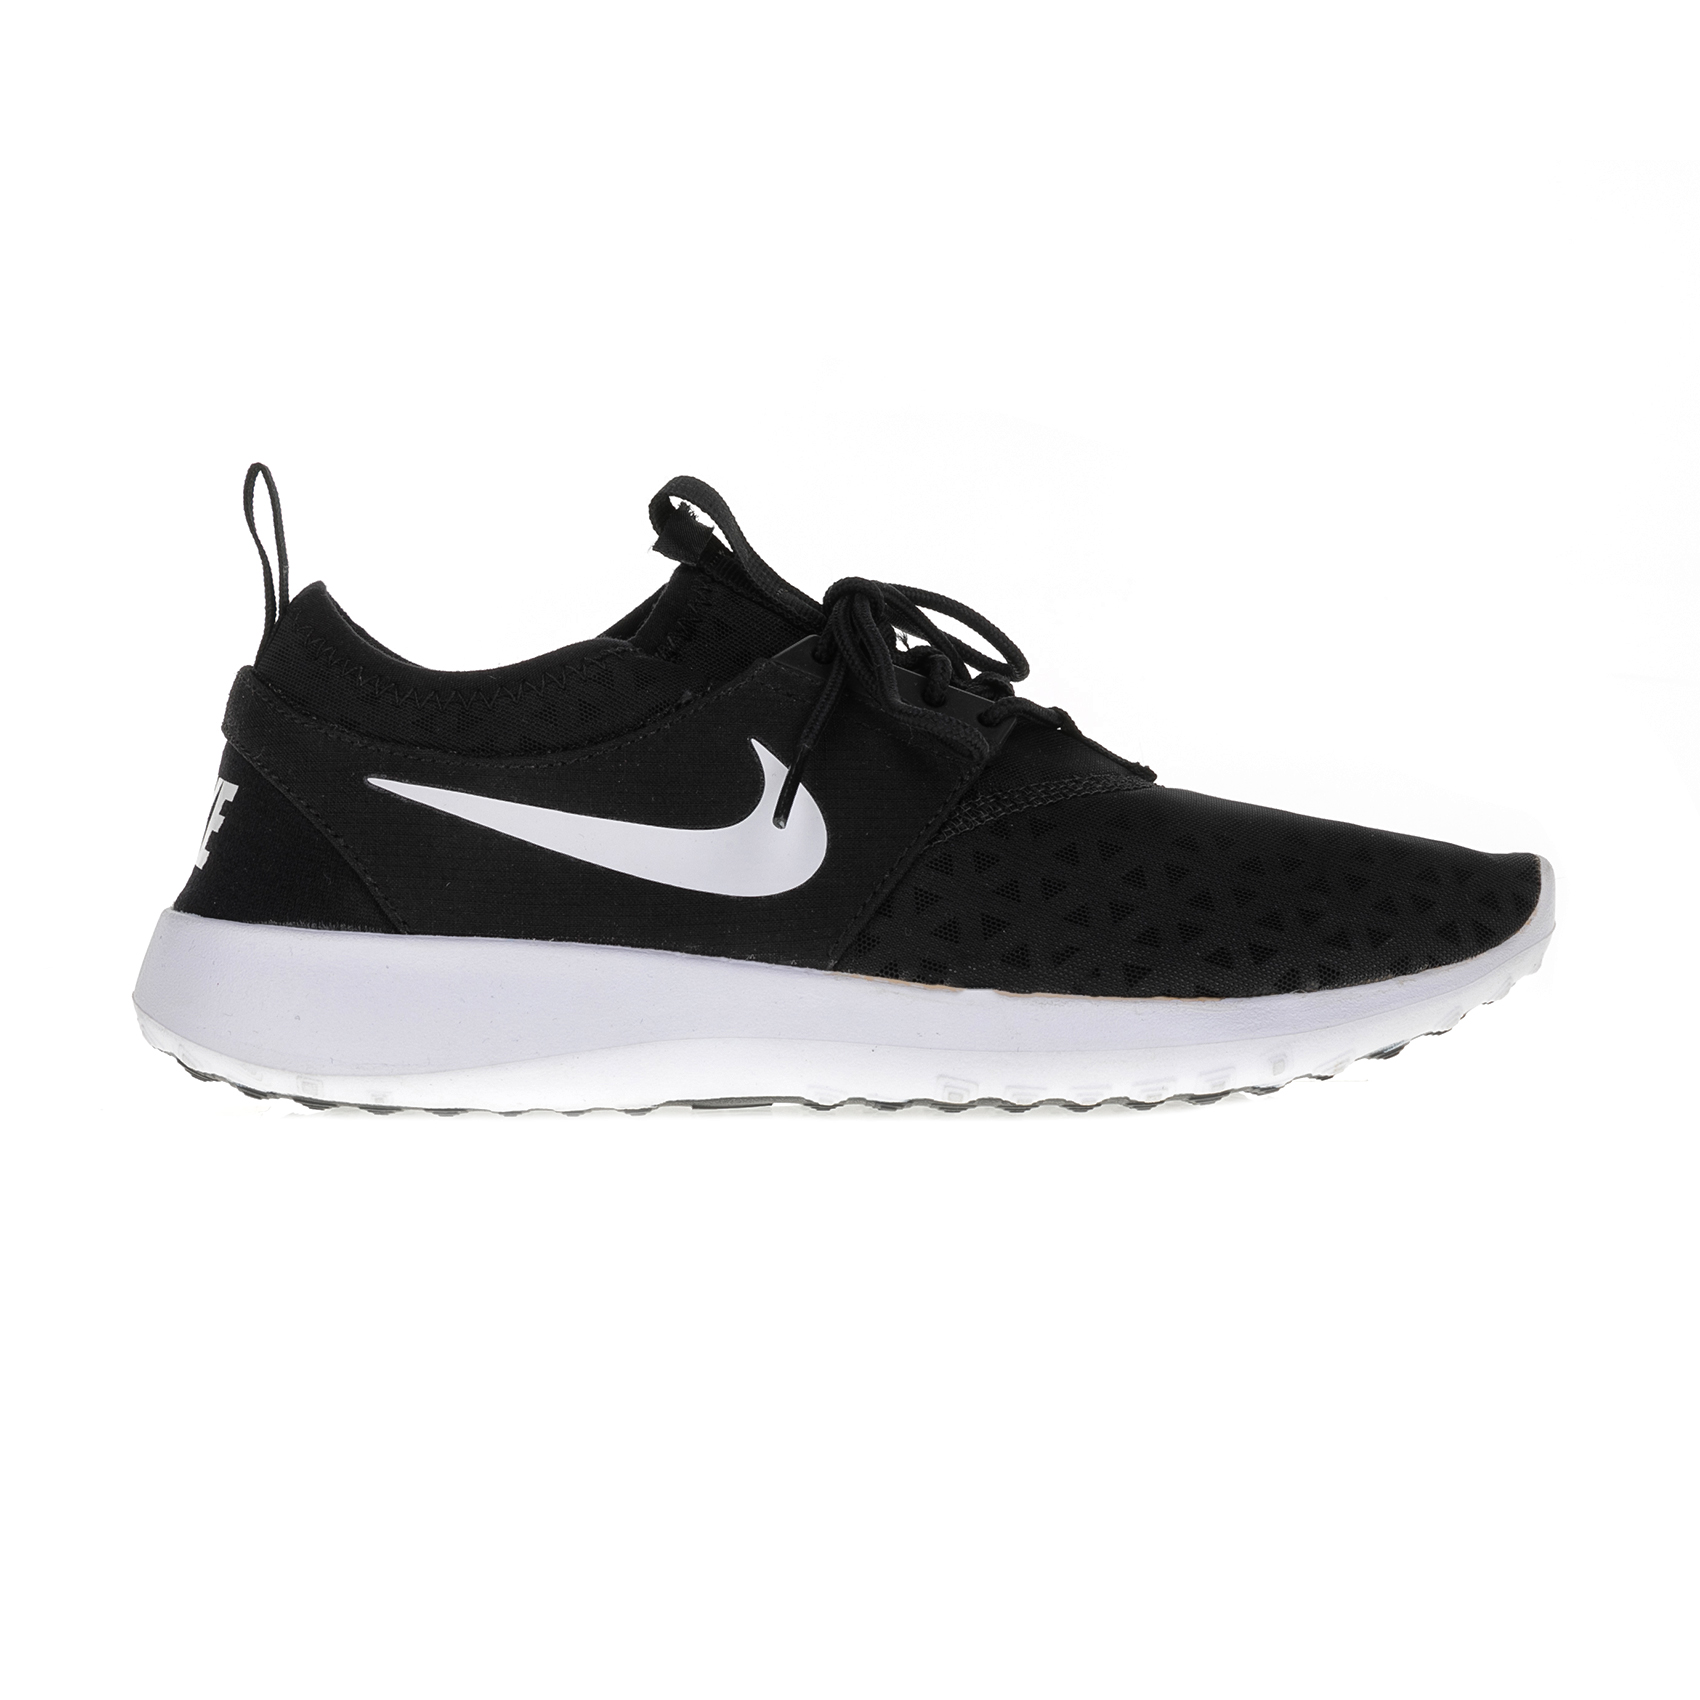 NIKE – Γυναικεία αθλητικά παπούτσια Nike JUVENATE μαύρα